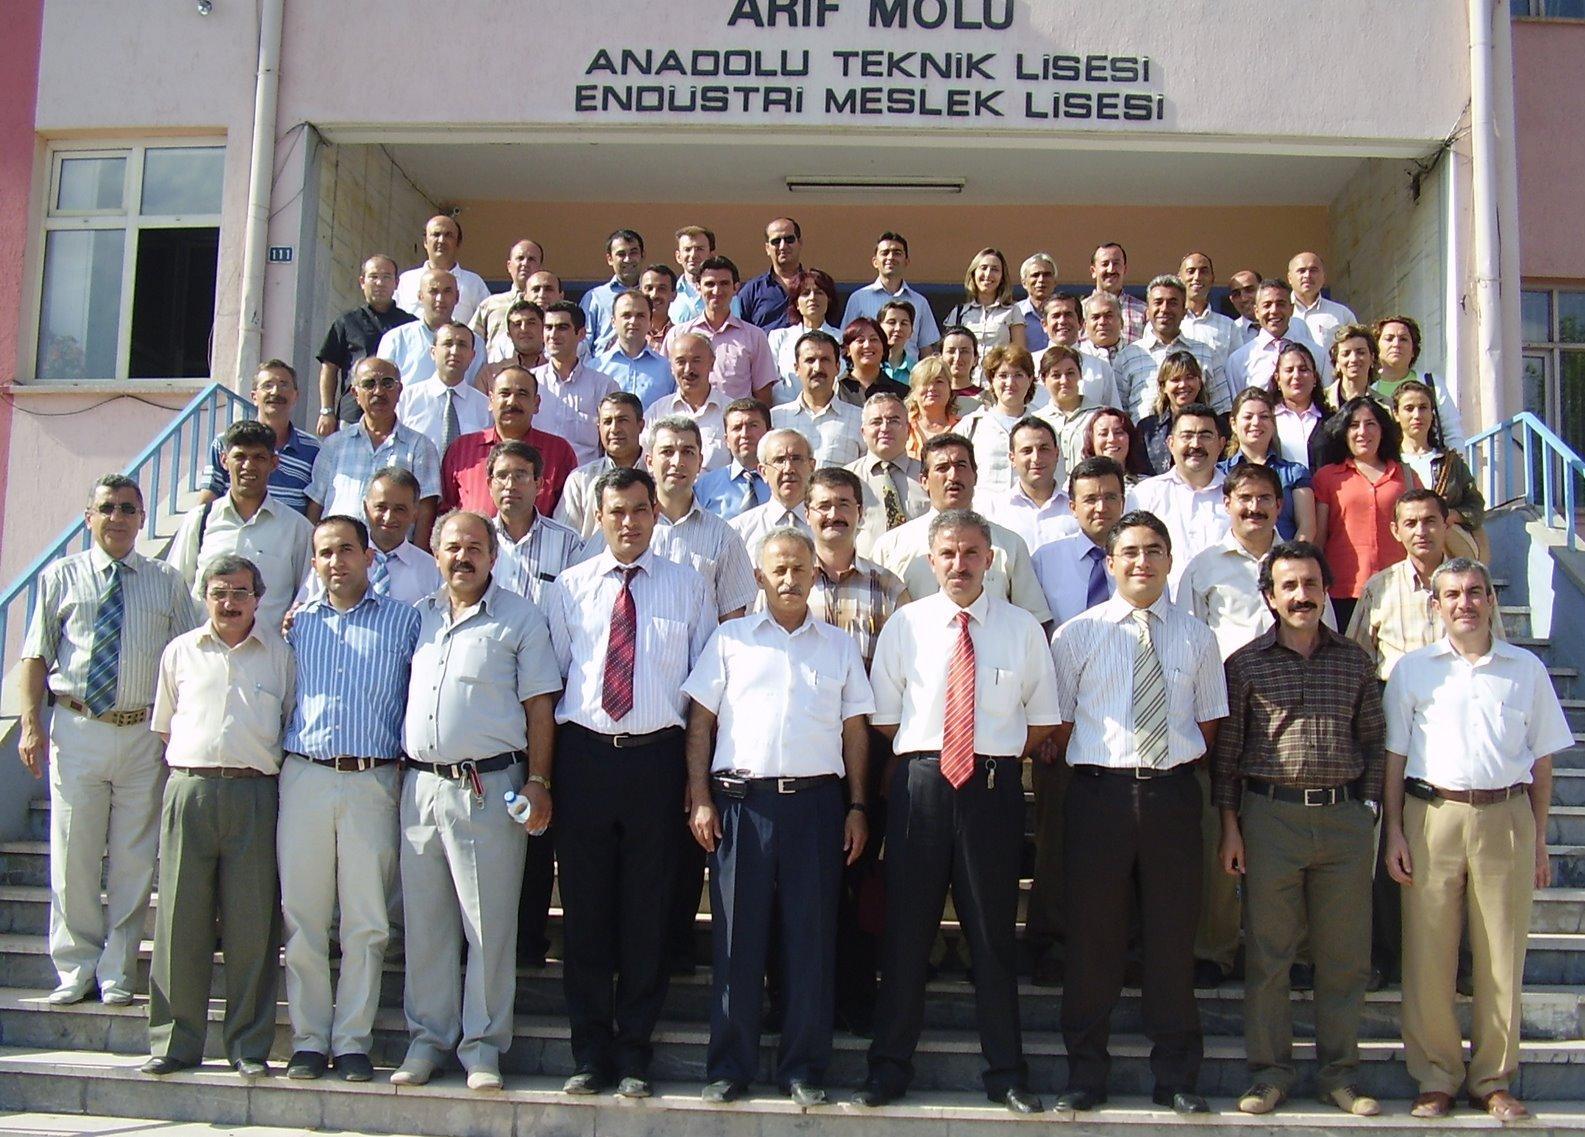 Arif Molu Teknik ve Endüstri Meslek Lisesi Kayseri